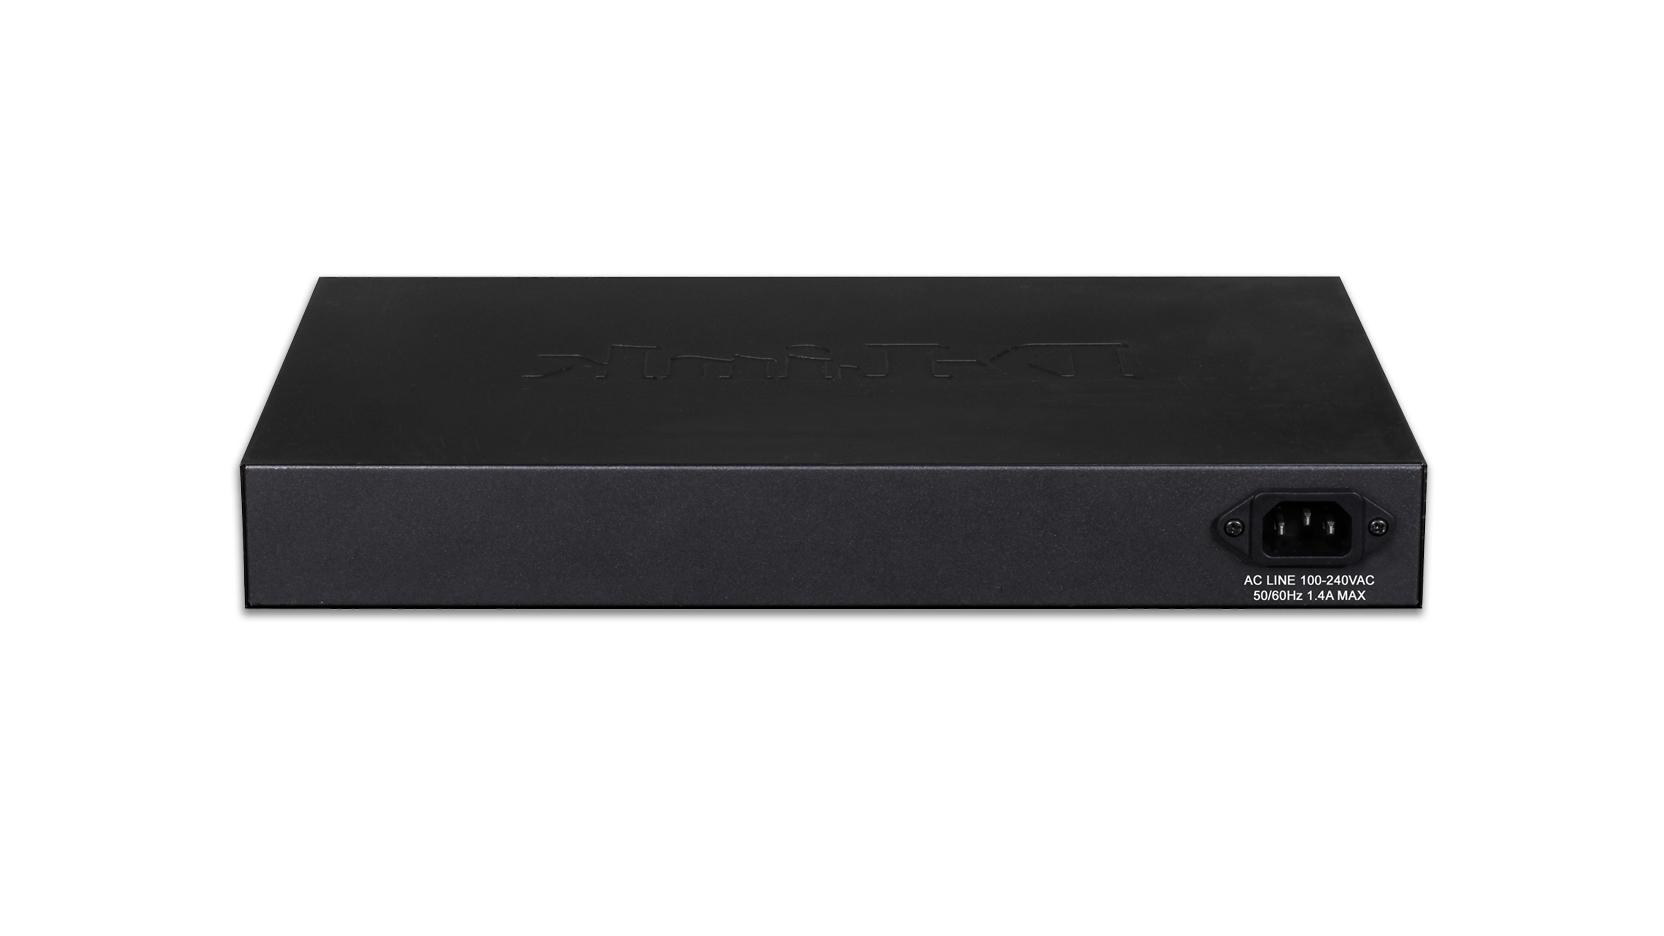 D Link Dgs 1210 10 Managed Network Switch L2 Gigabit Ethernet Smart E